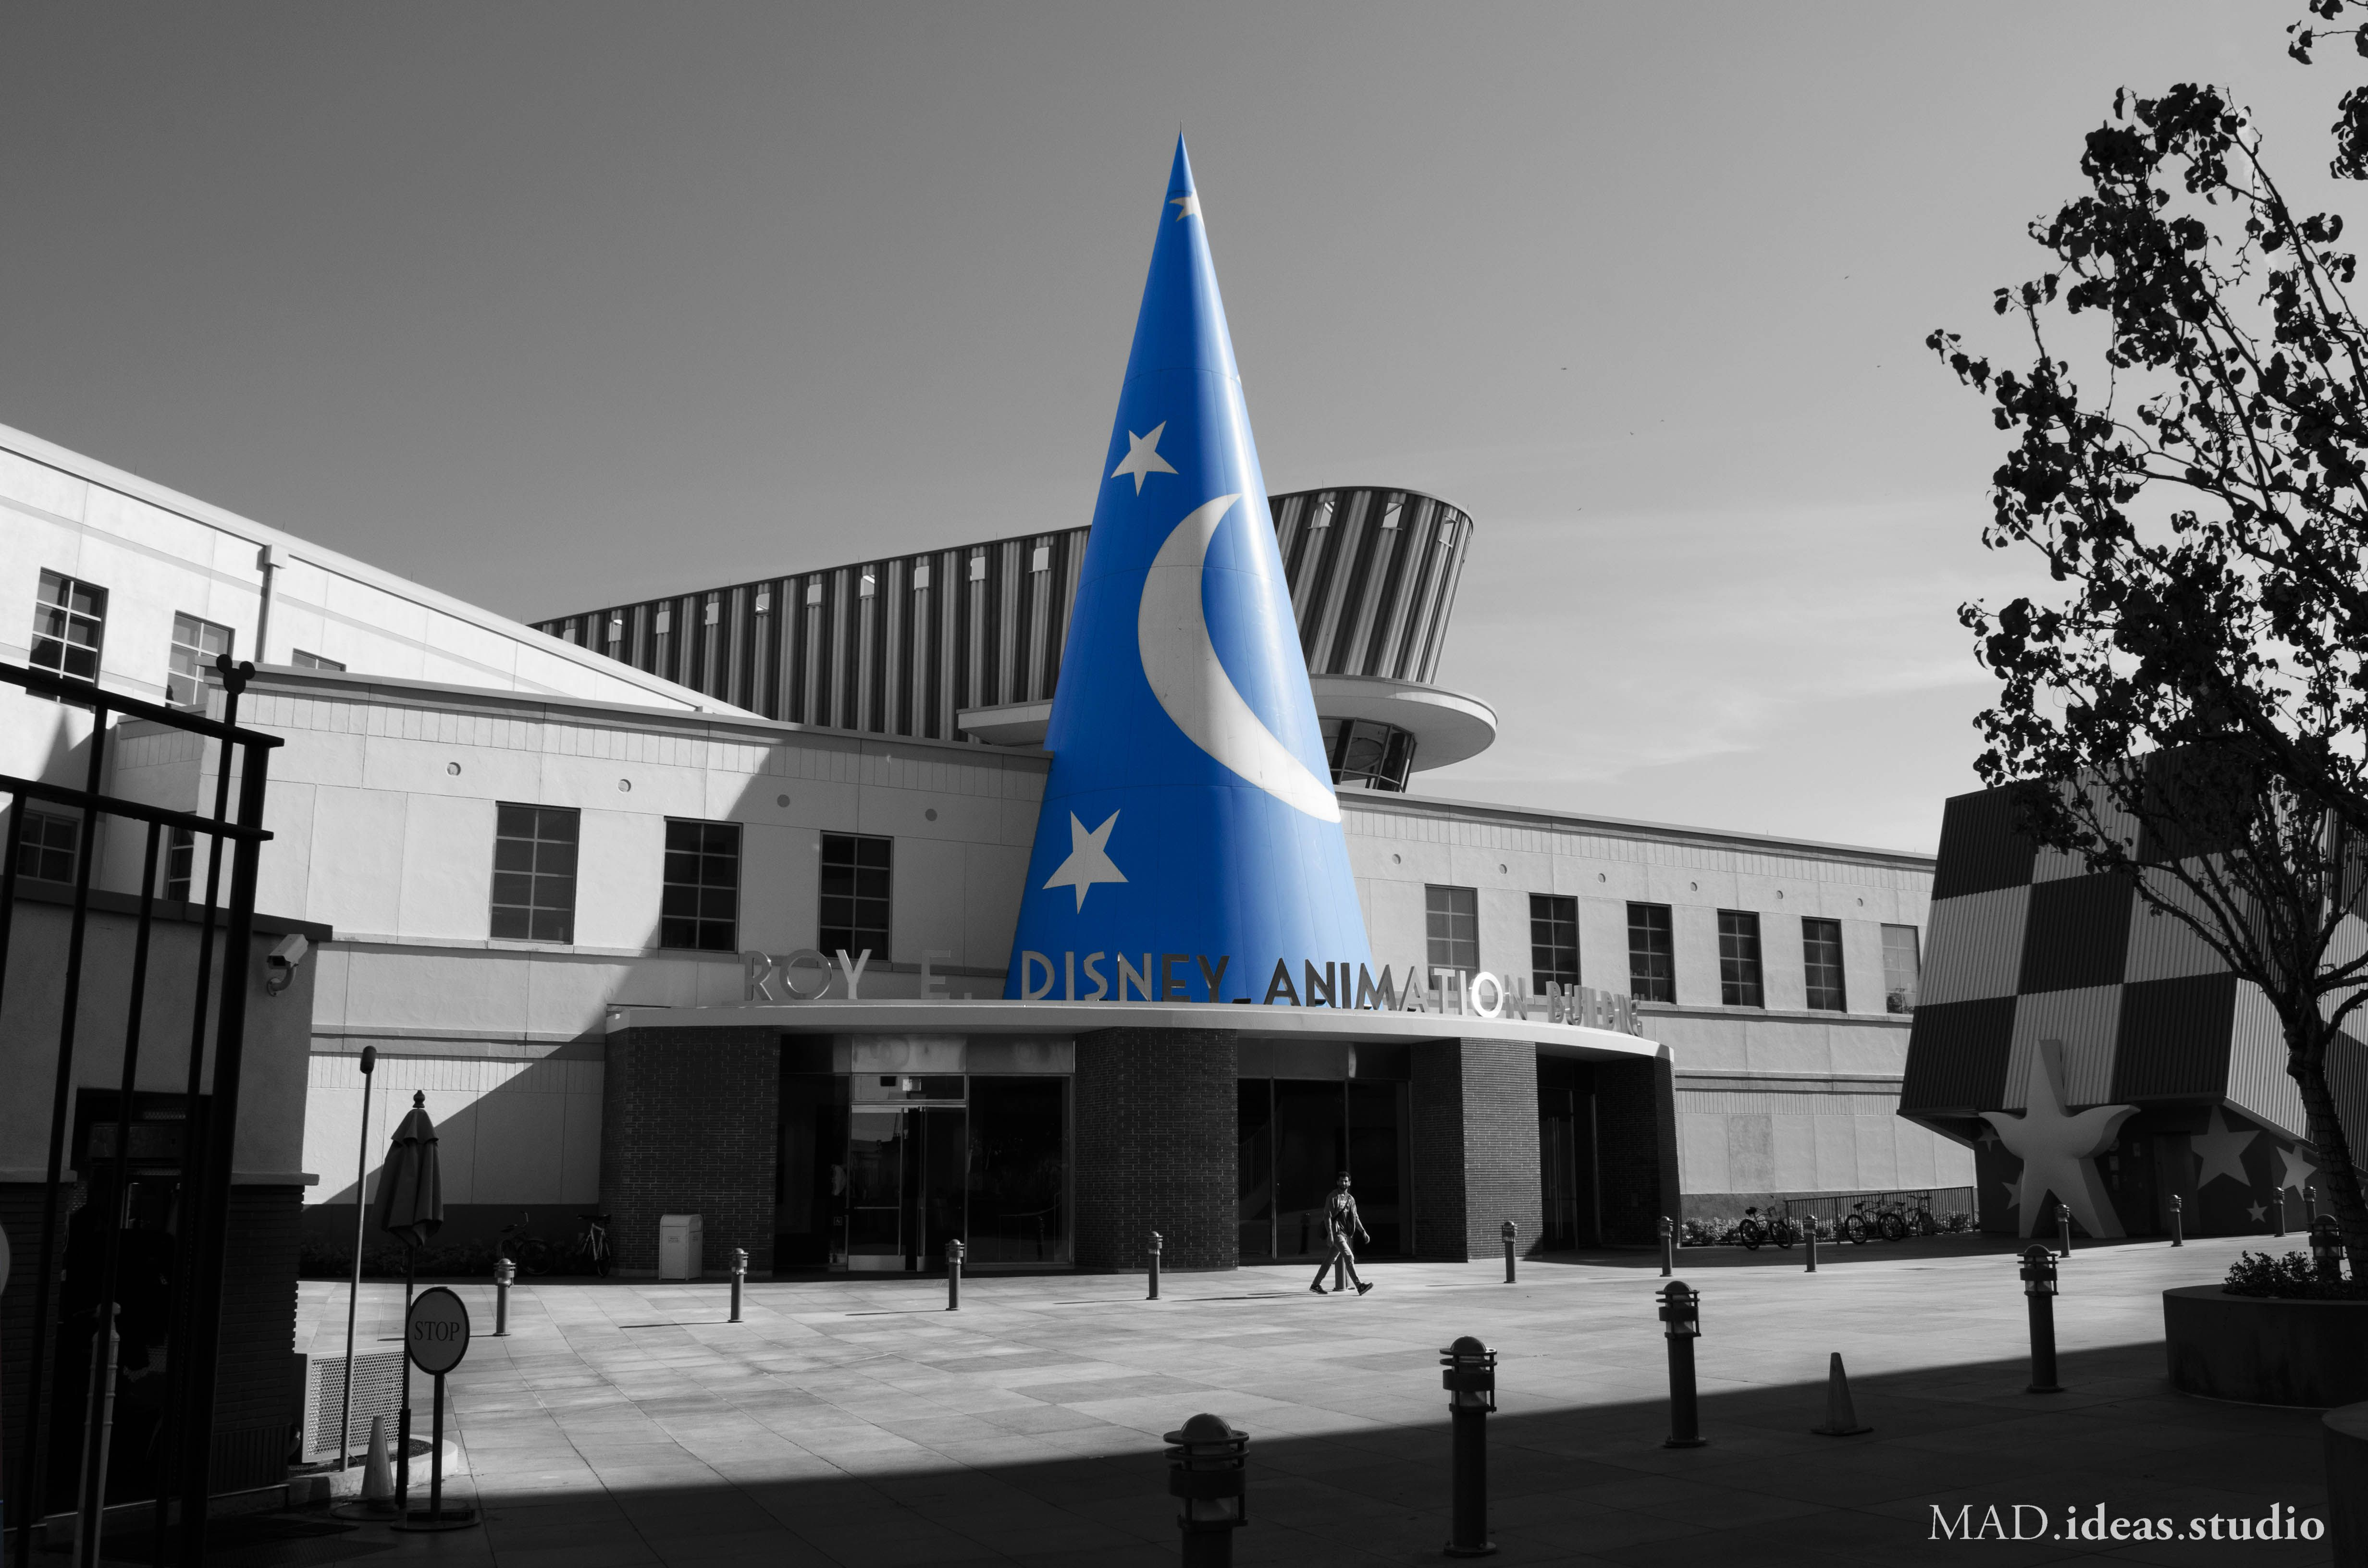 Disney Animation Studios Disney Photo Architecture Movie Studio Los